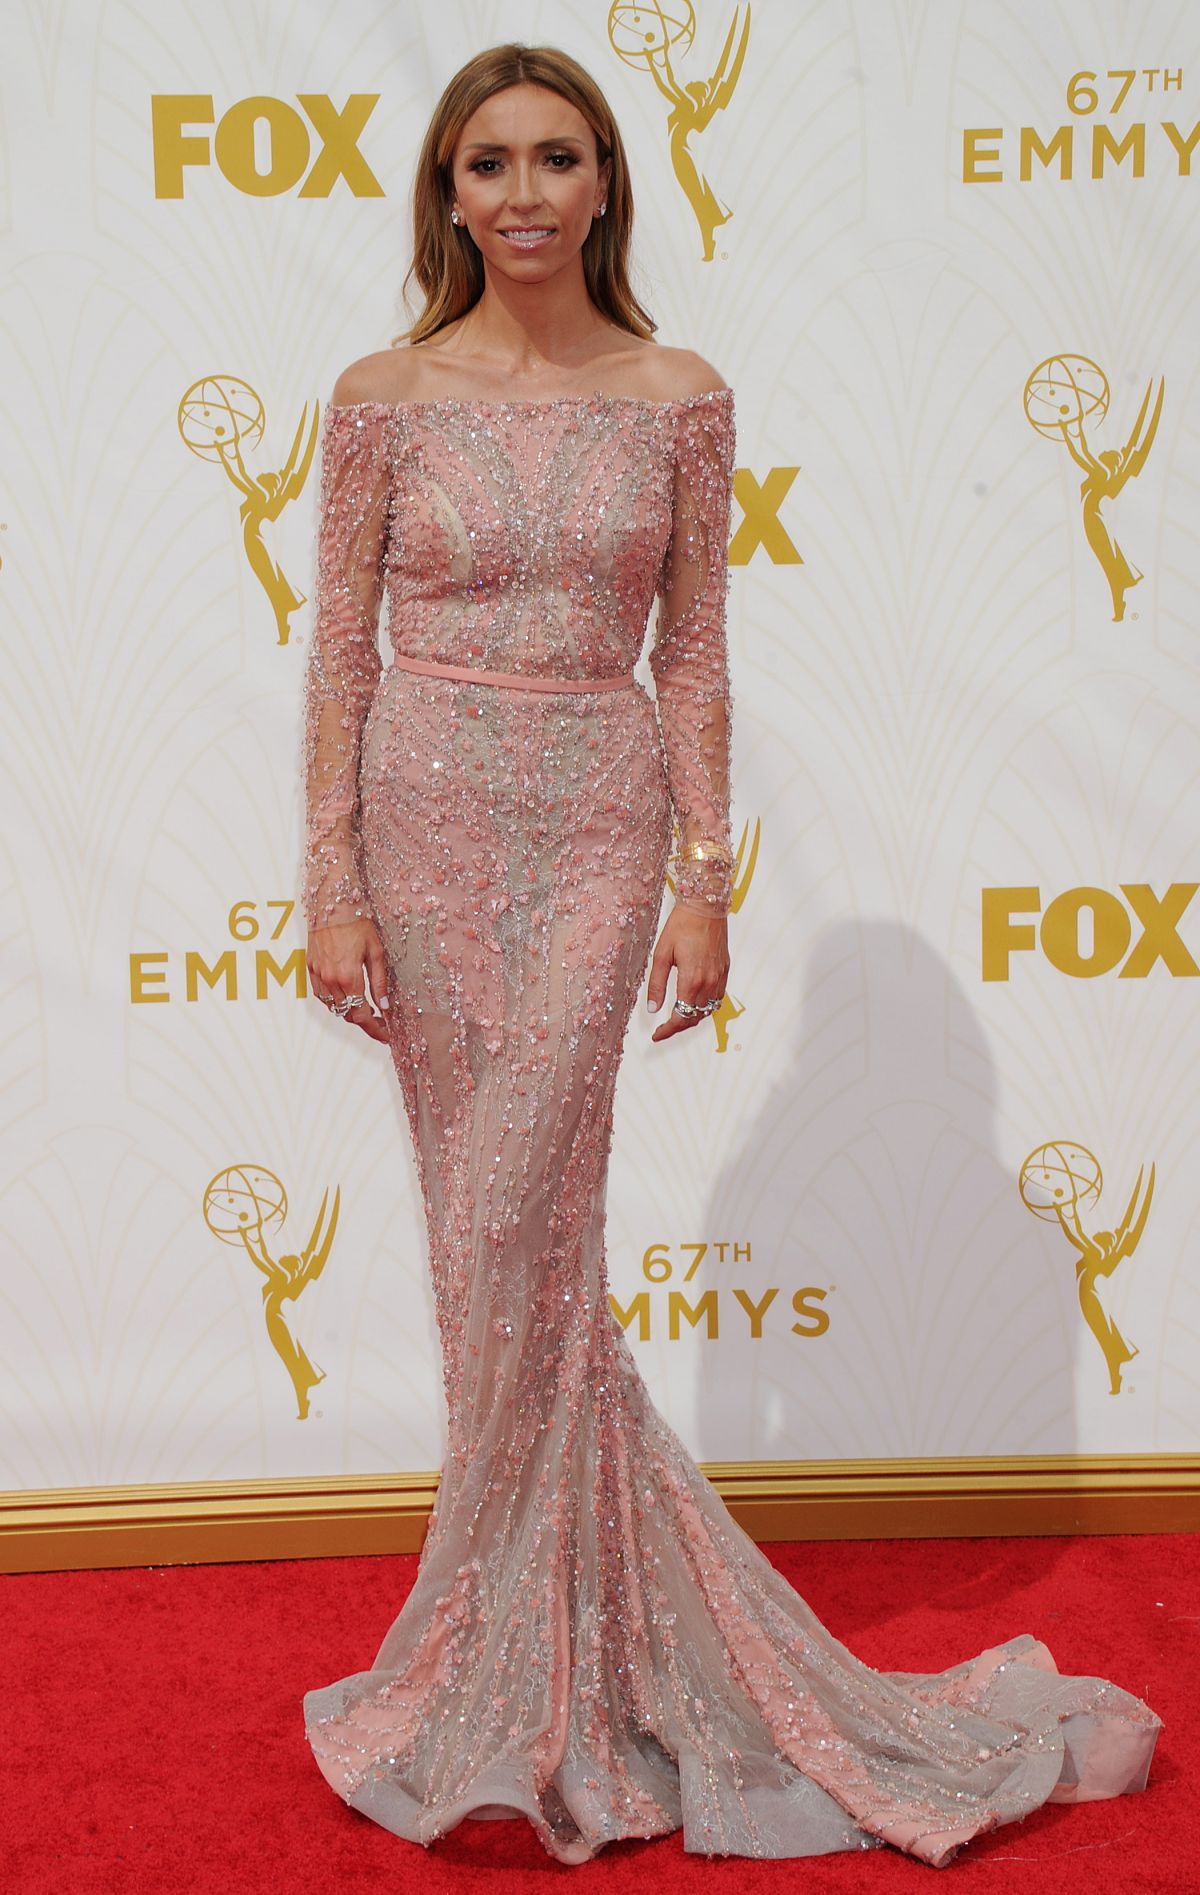 GIULIANA RANCIC at 2015 Emmy Awards in Los Angeles 09/20/2015